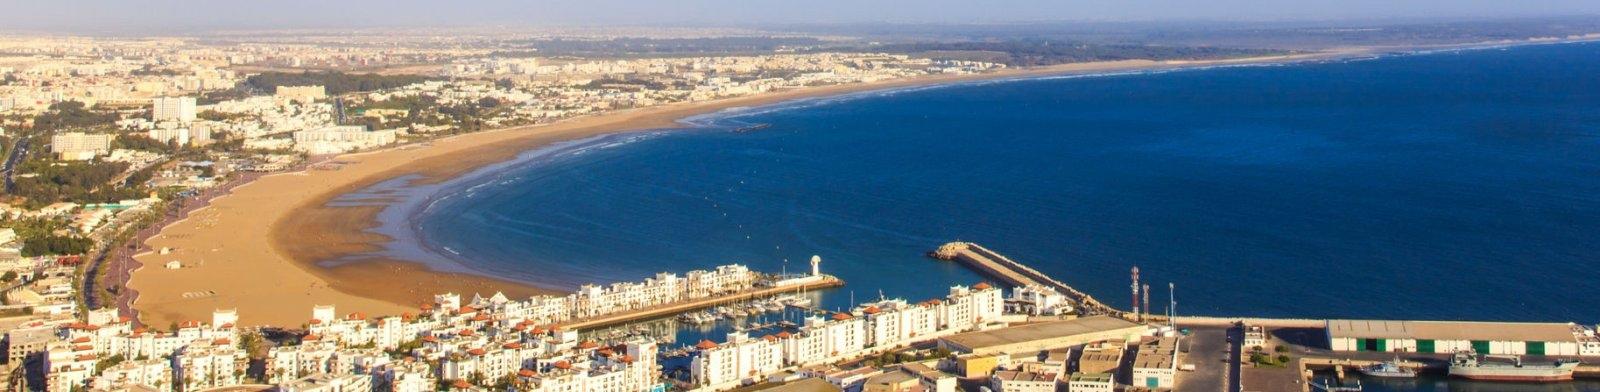 Agadir view